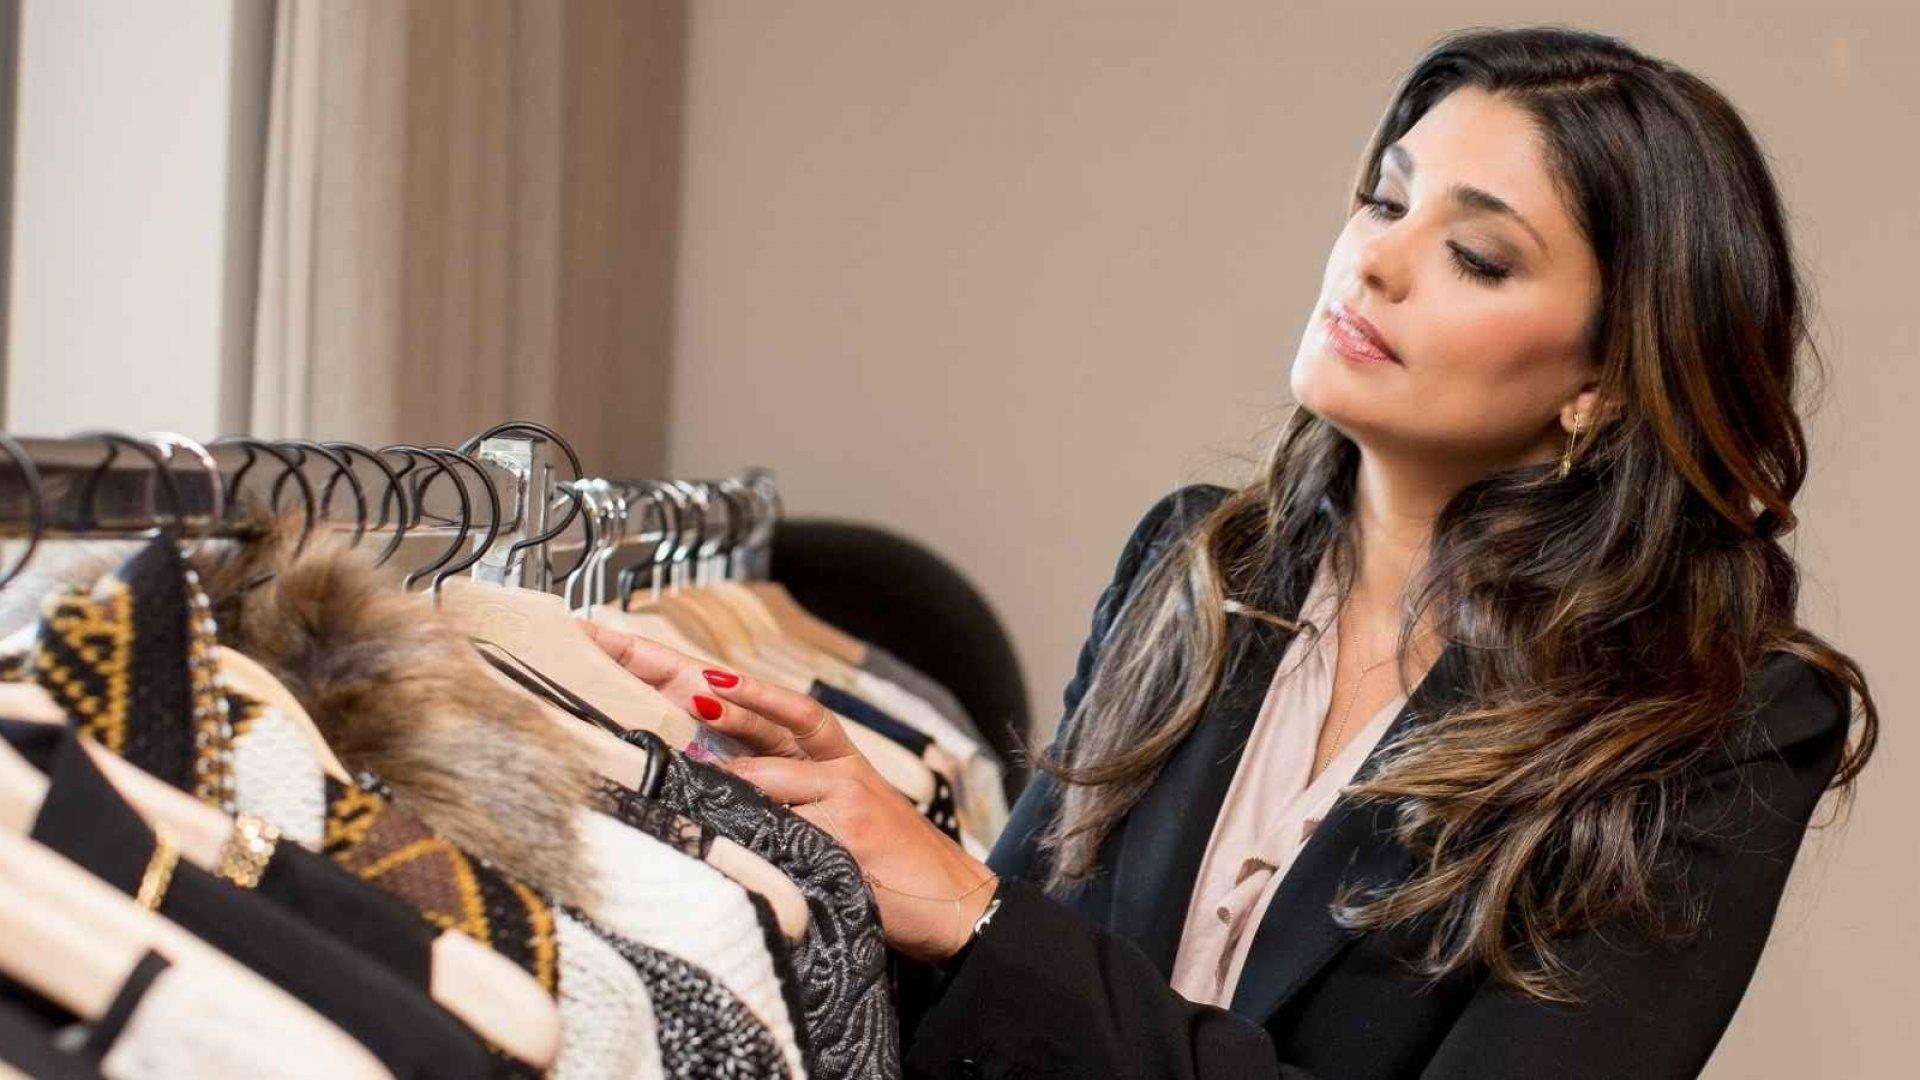 How Designer Rachel Roy Battled to Win Back Her Fashion Empire